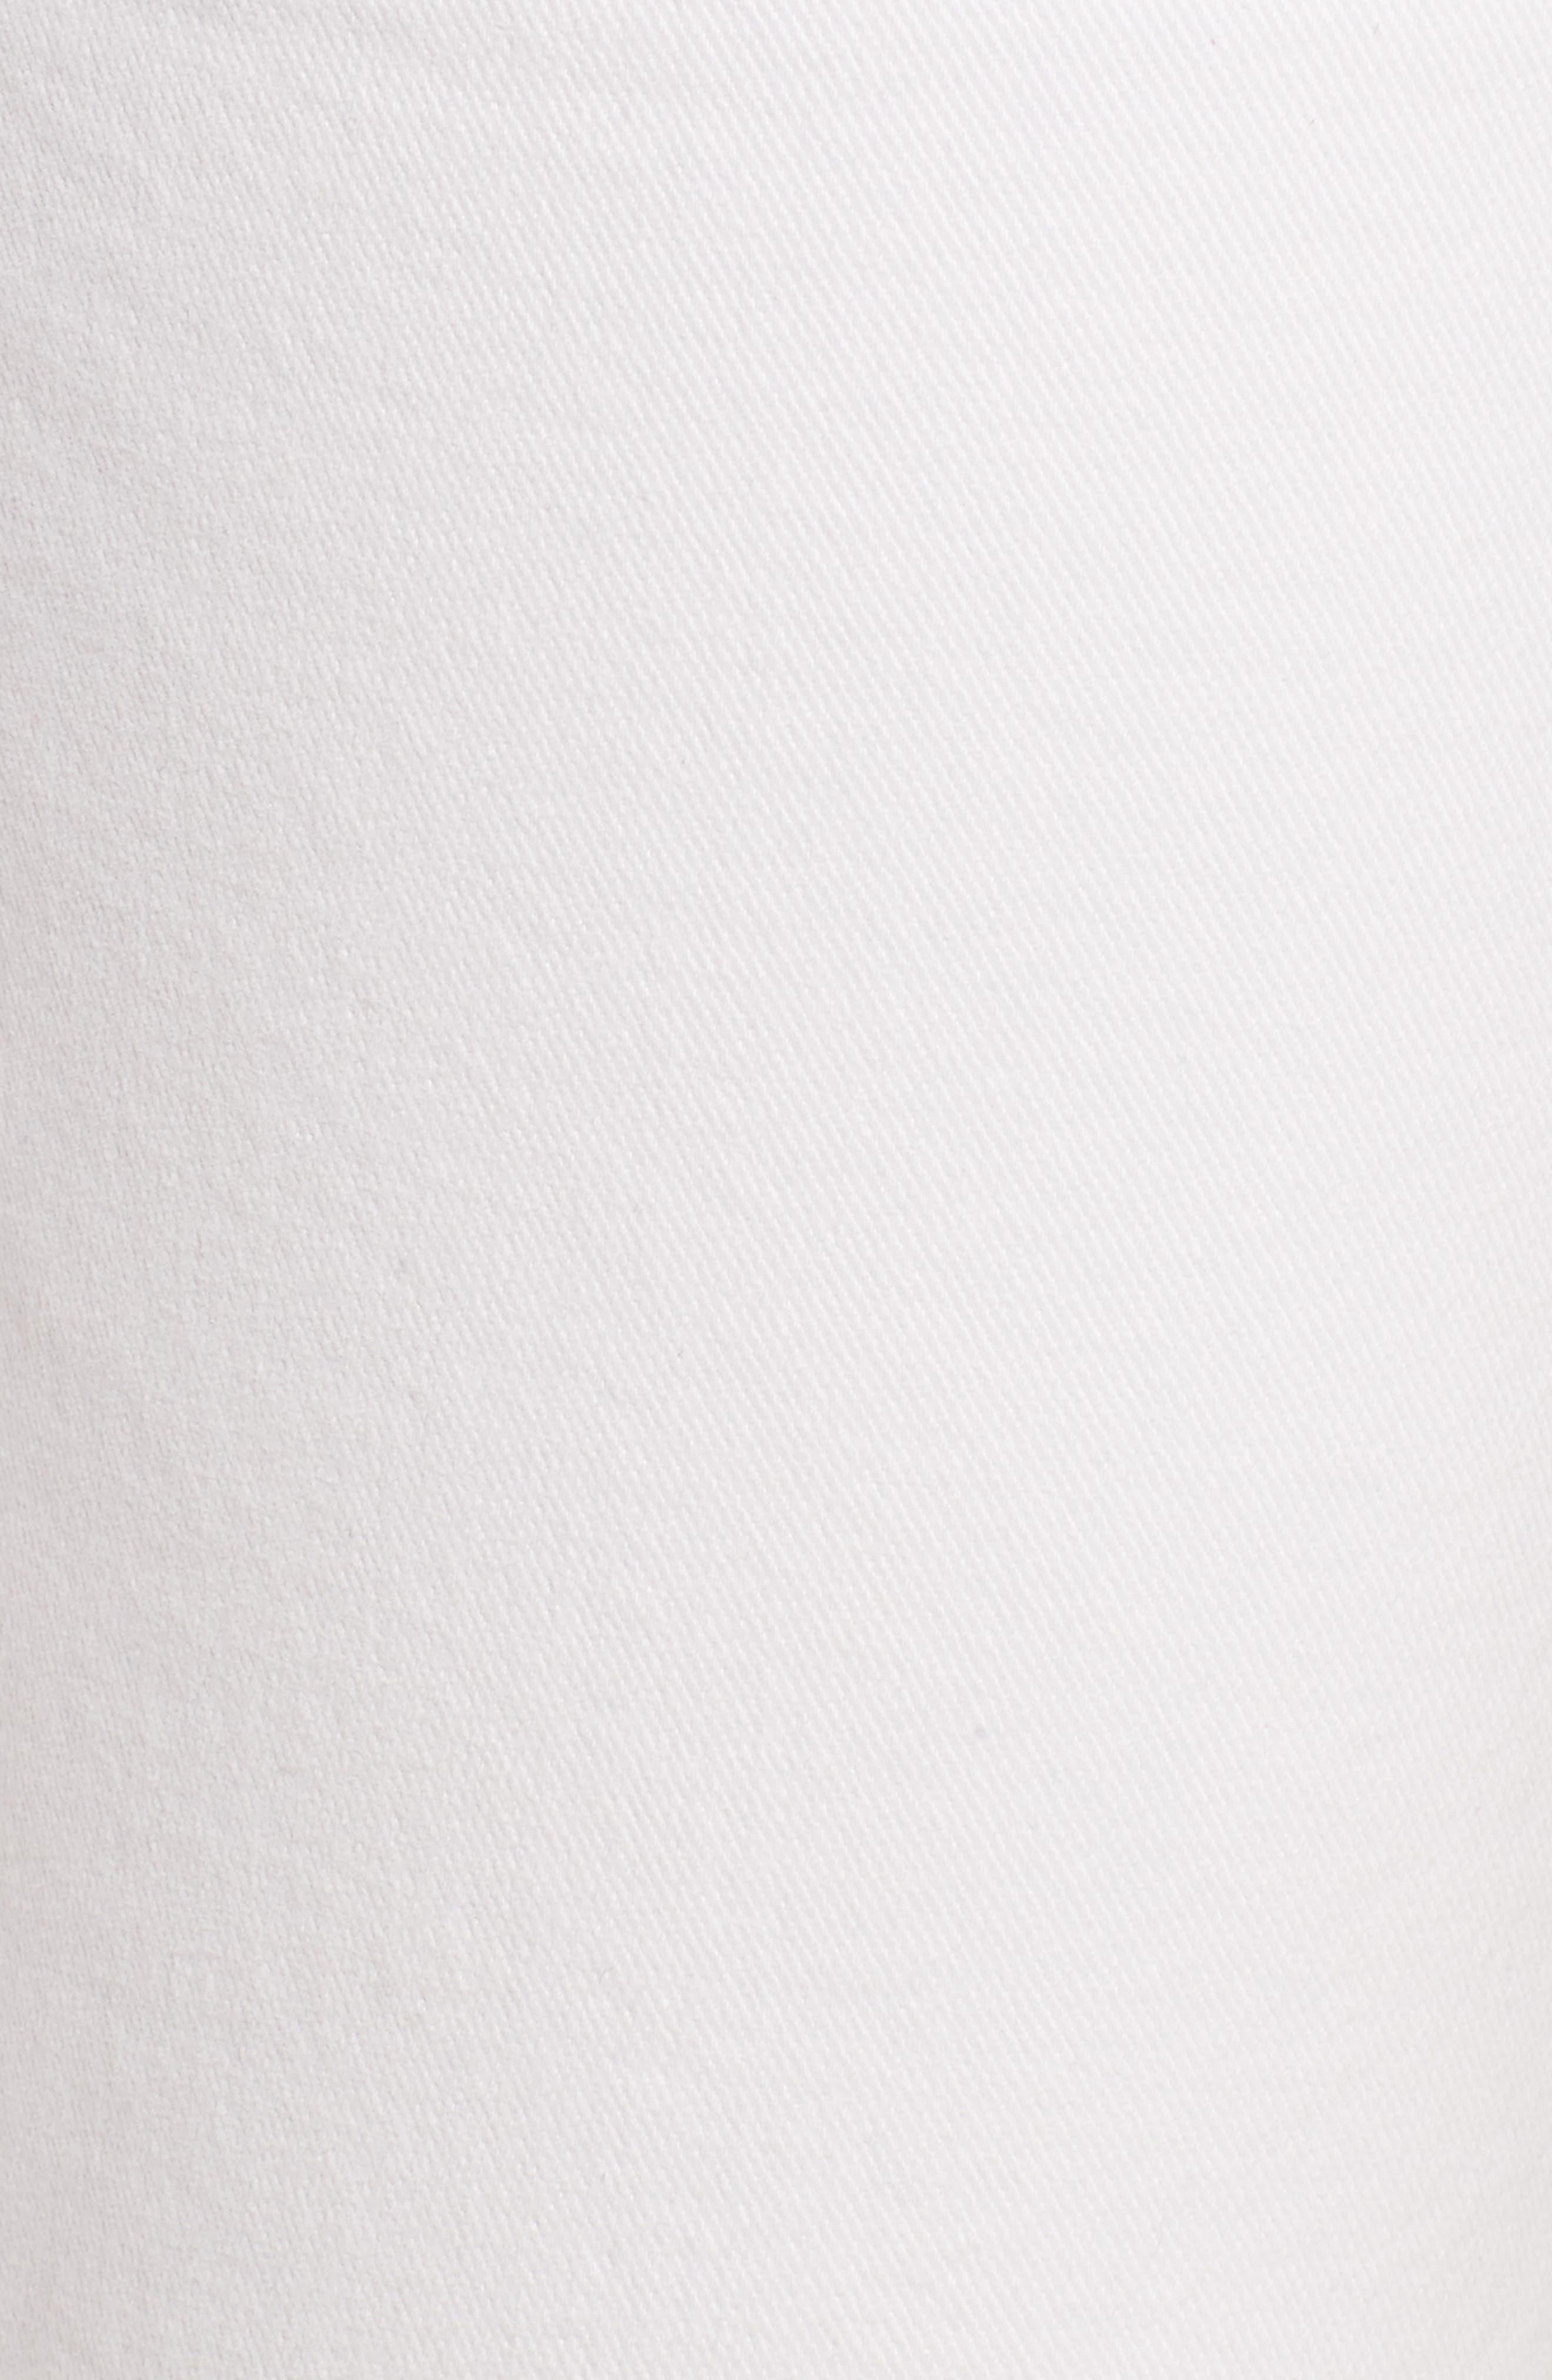 PAIGE, Skyline Raw Hem Crop Skinny Jeans, Alternate thumbnail 6, color, LIVED IN CRISP WHITE